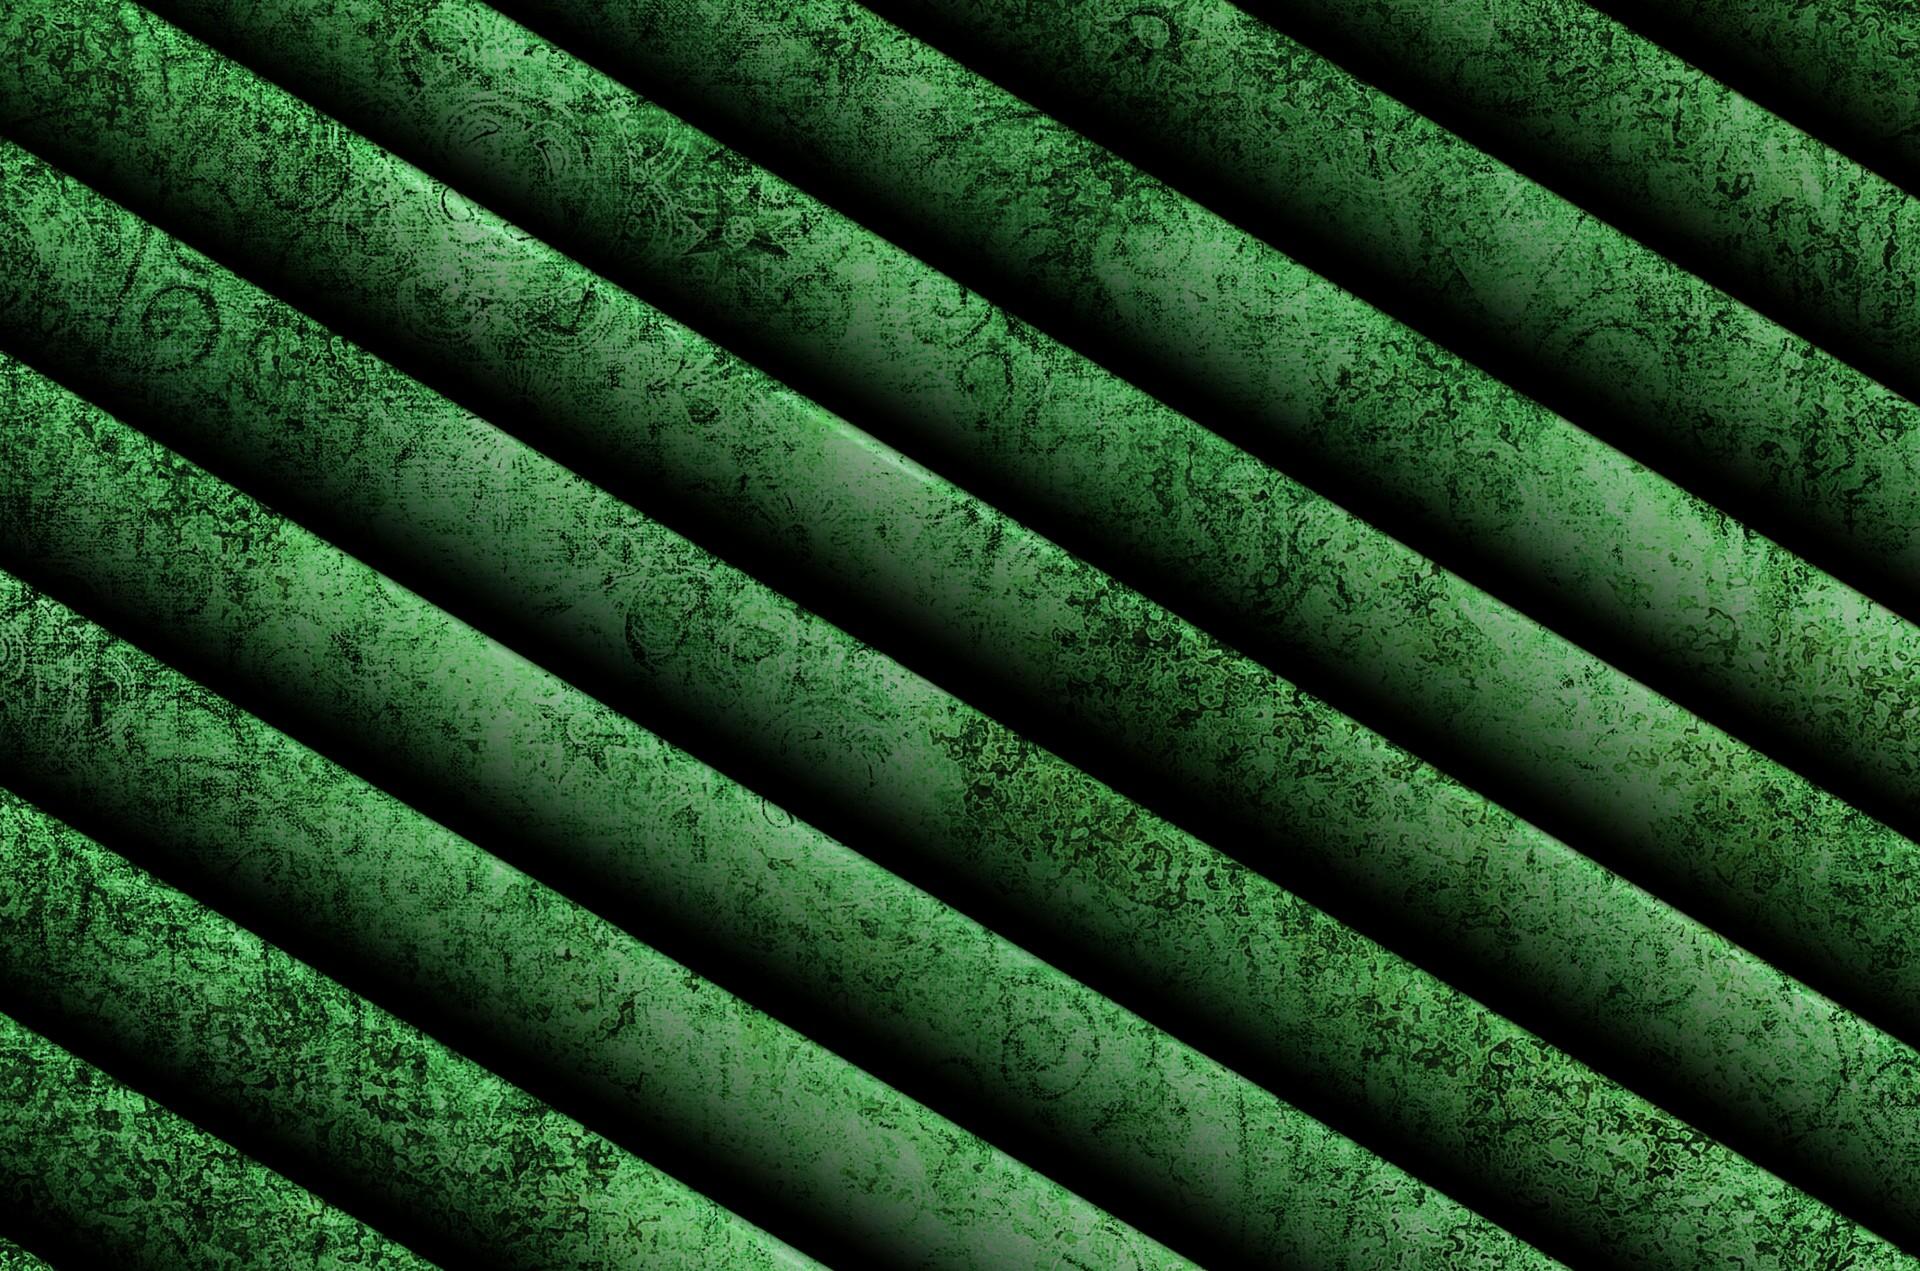 Black And White Striped Wallpaper Green Diagonal Grunge Background Free Stock Photo Public